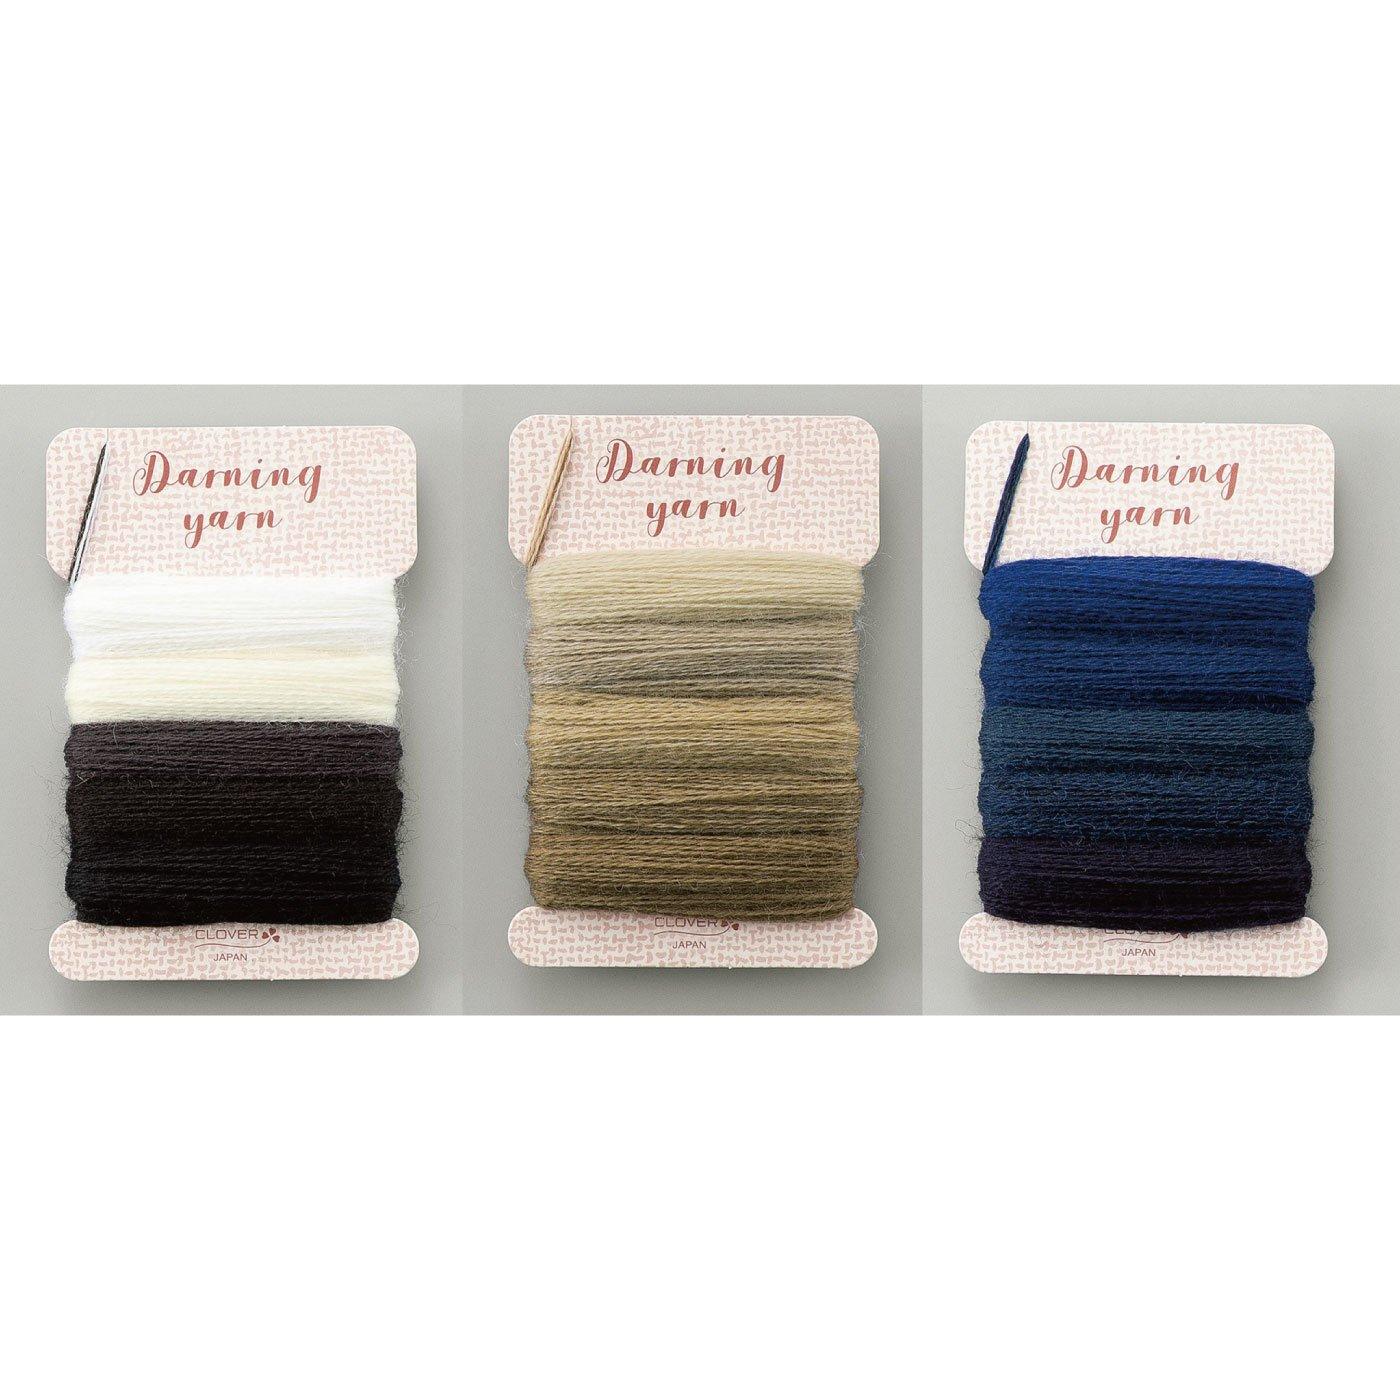 Clover(クロバー) ダーニング糸ナチュラルカラー3巻15色セット